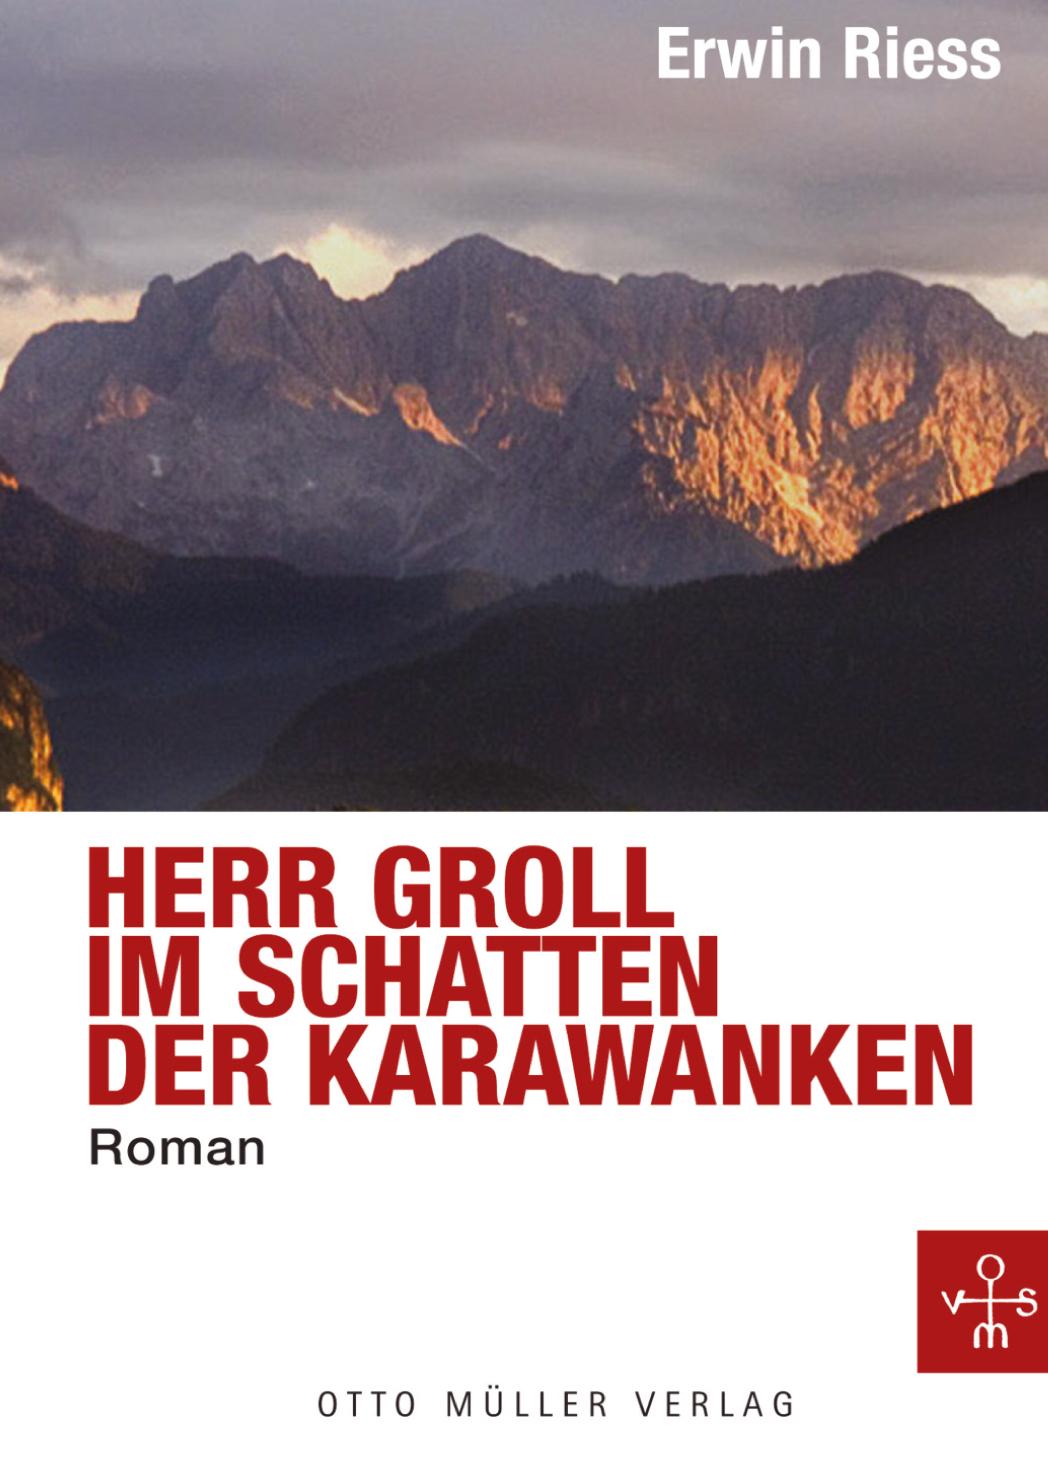 Herr Groll im Schatten der Karawanken ( Erwin  Riess  )